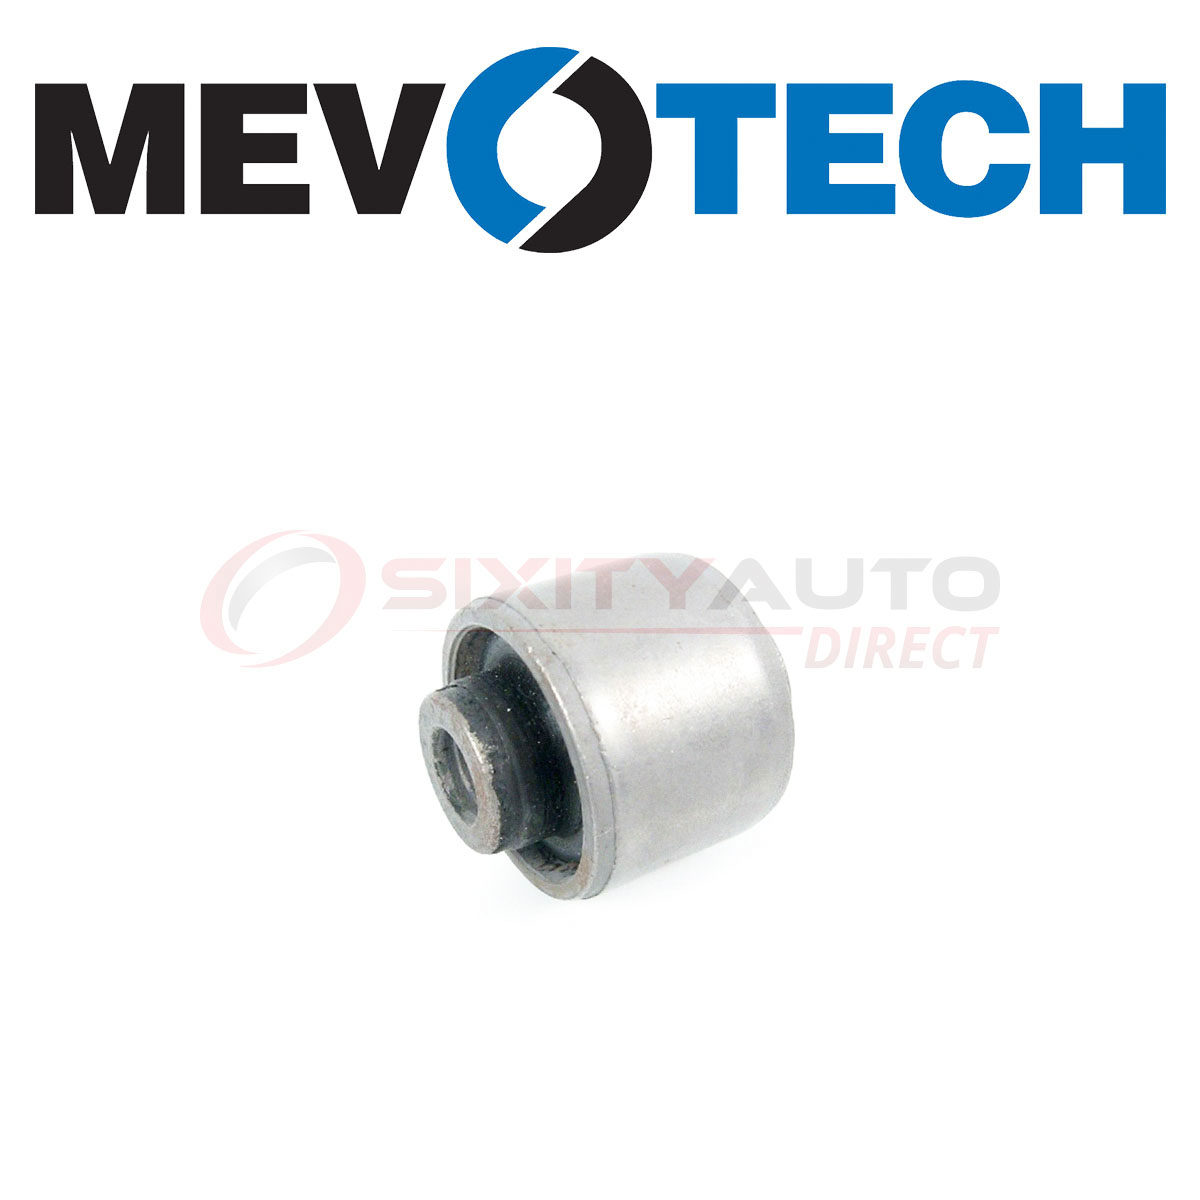 Mevotech Front Strut Mount Kit for 1988-2000 Honda Civic Suspension Shocks cc